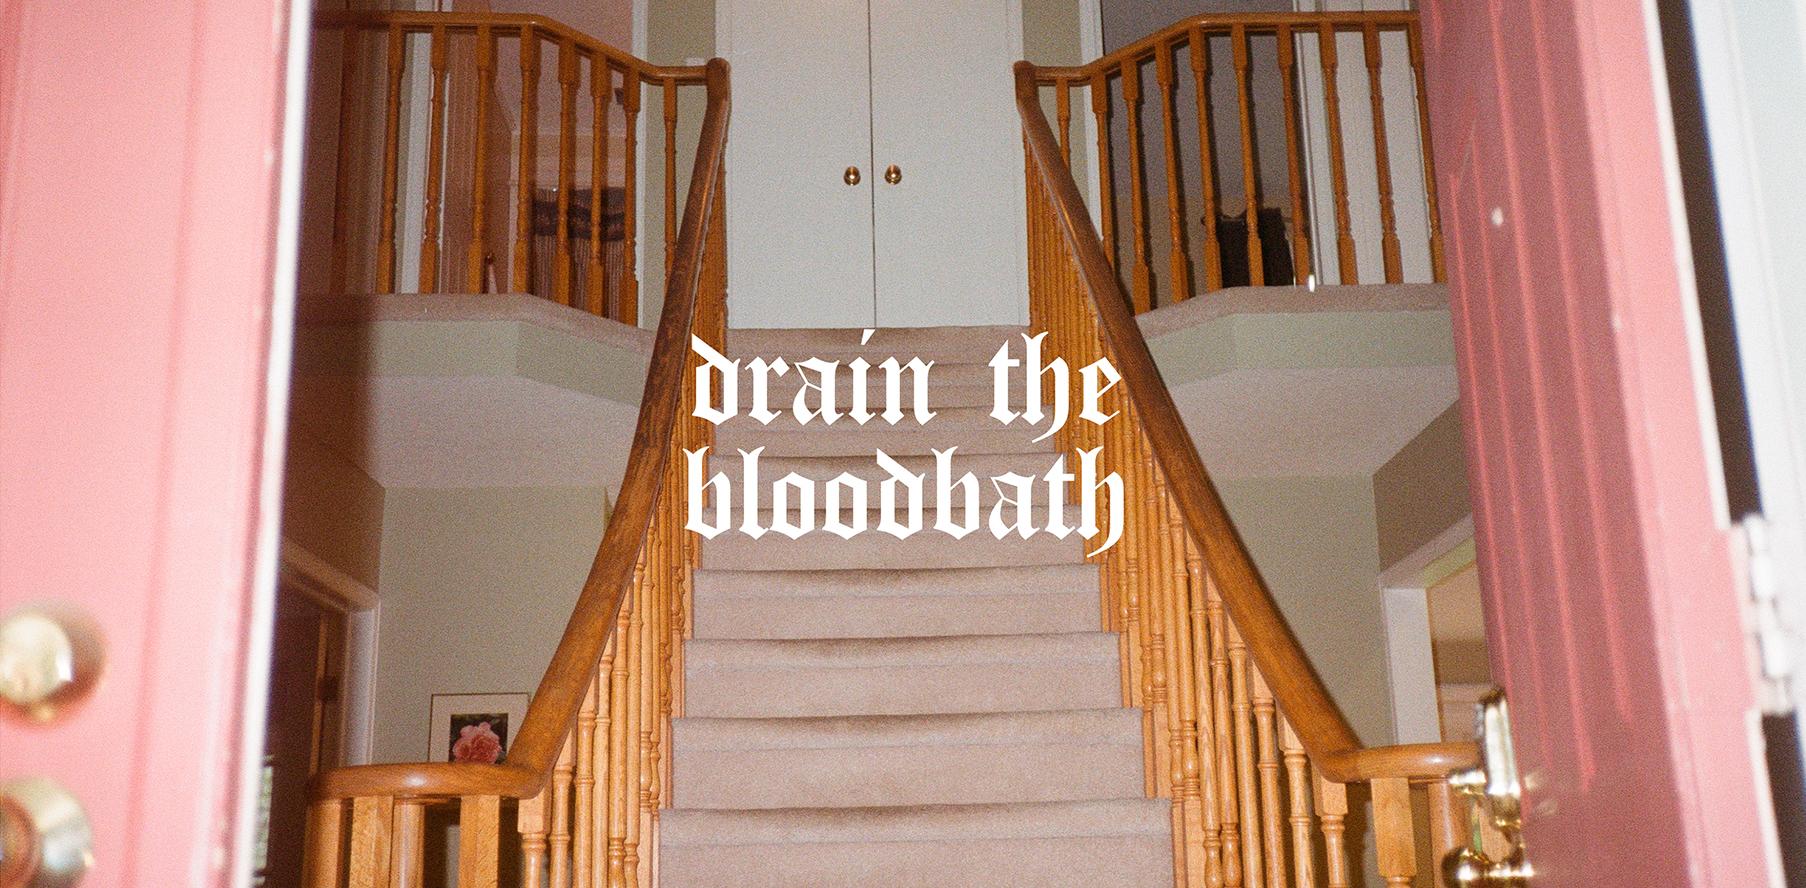 drain the bloodbath